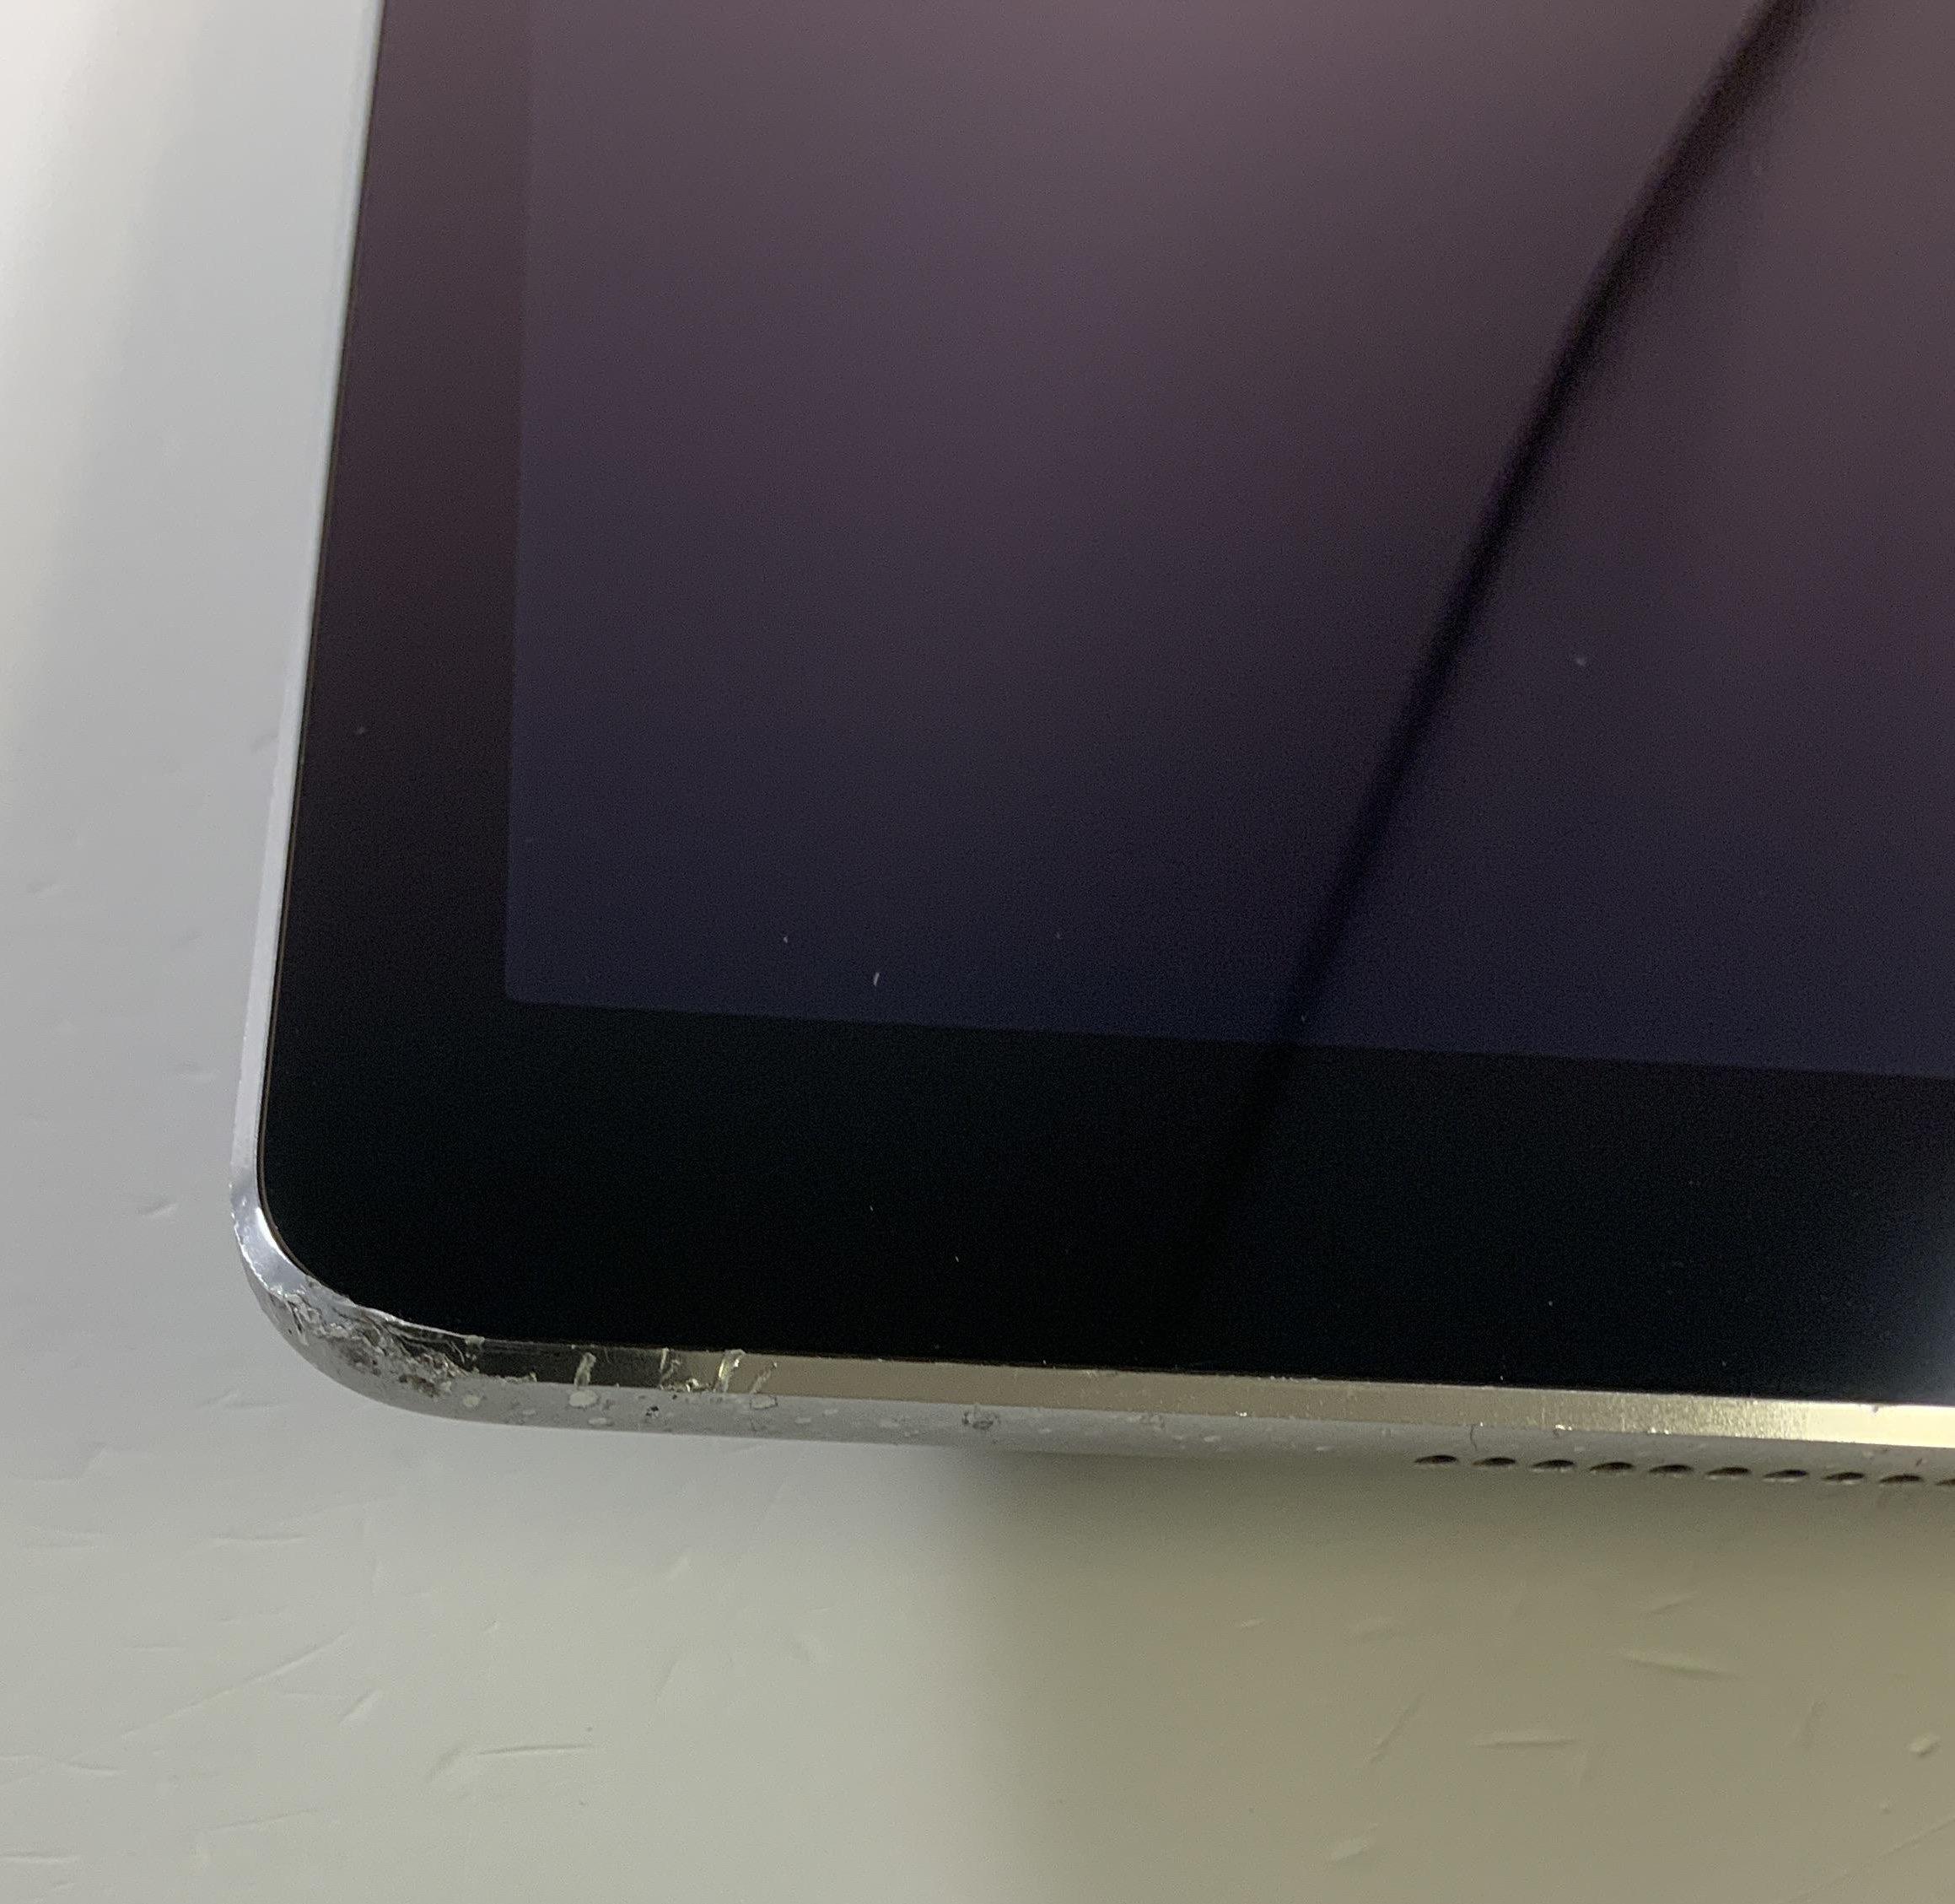 iPad Air 2 Wi-Fi + Cellular 64GB, 64GB, Space Gray, imagen 4